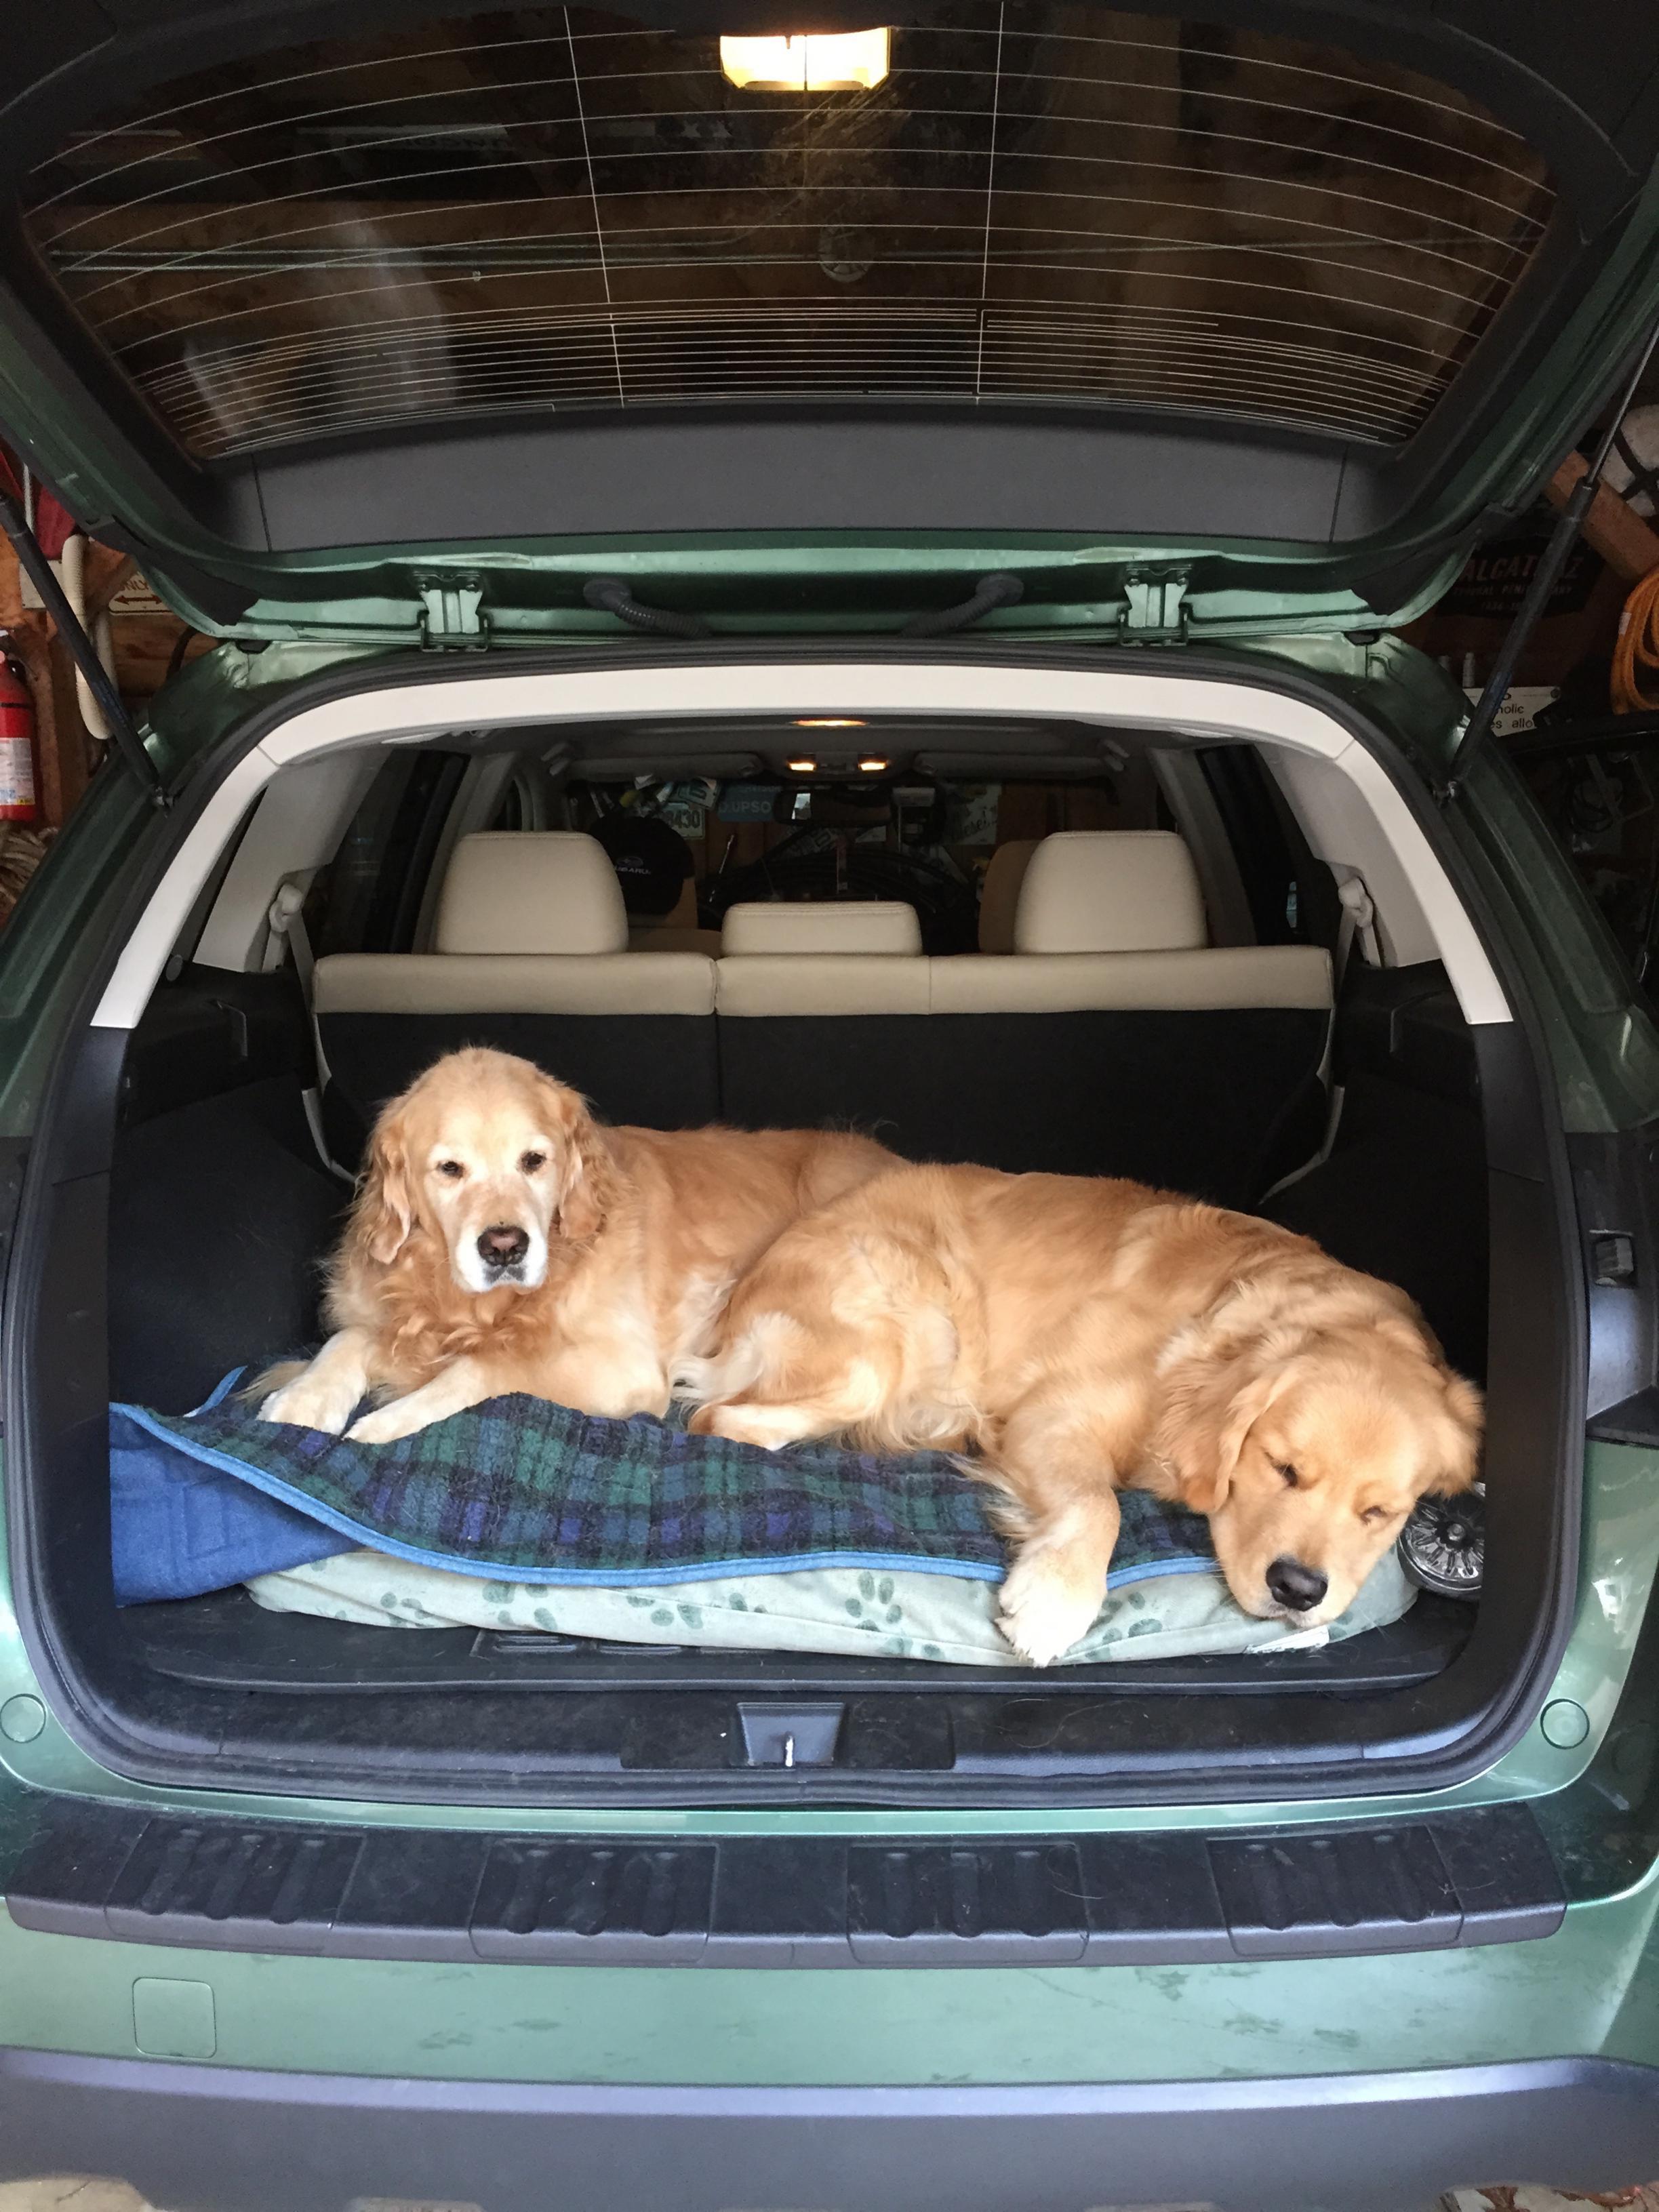 Big Dogs in 15 outback - Page 2 - Subaru Outback - Subaru ...